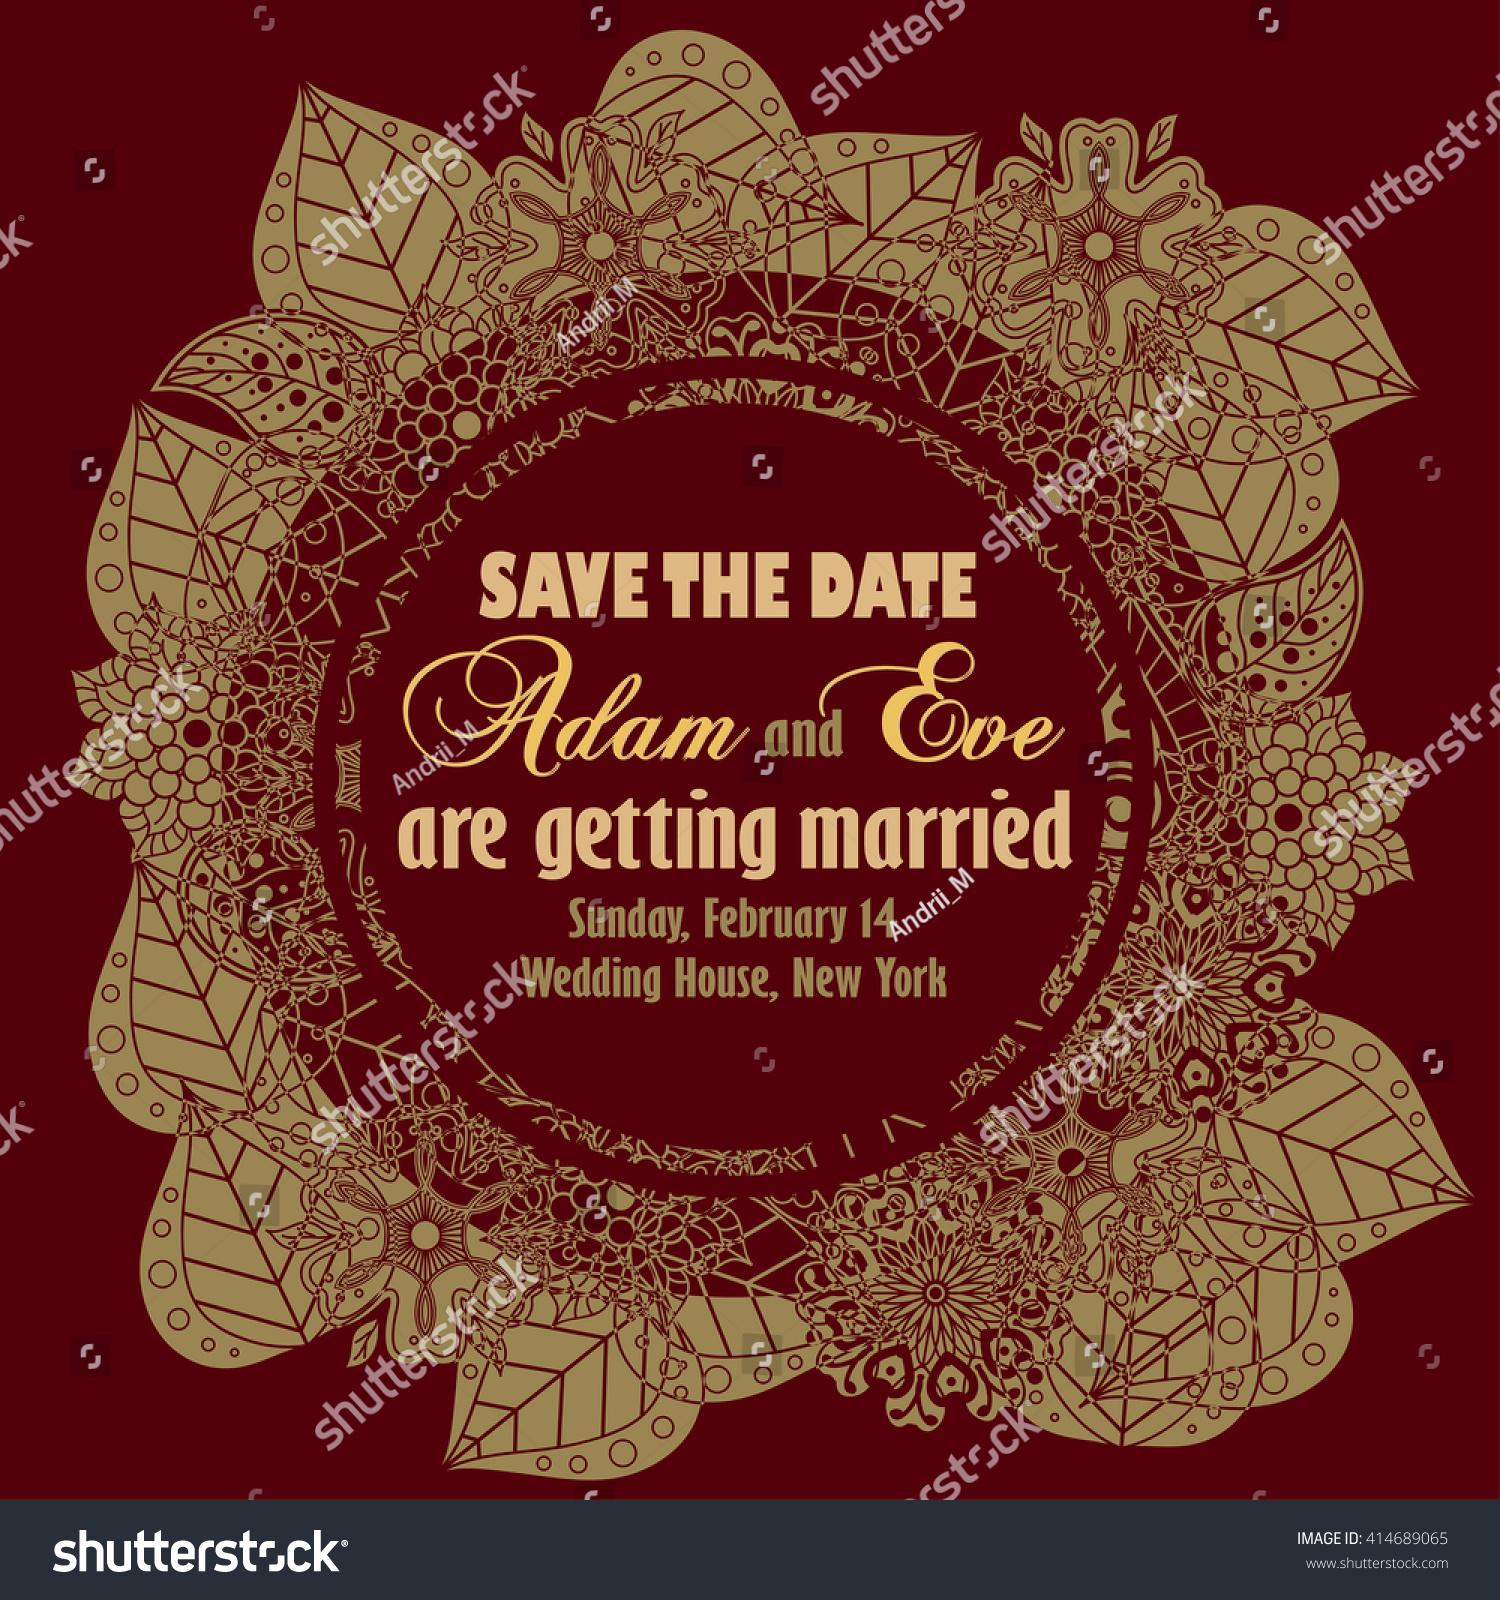 Wedding Invitation Save Date Card Floral Stock Illustration ...